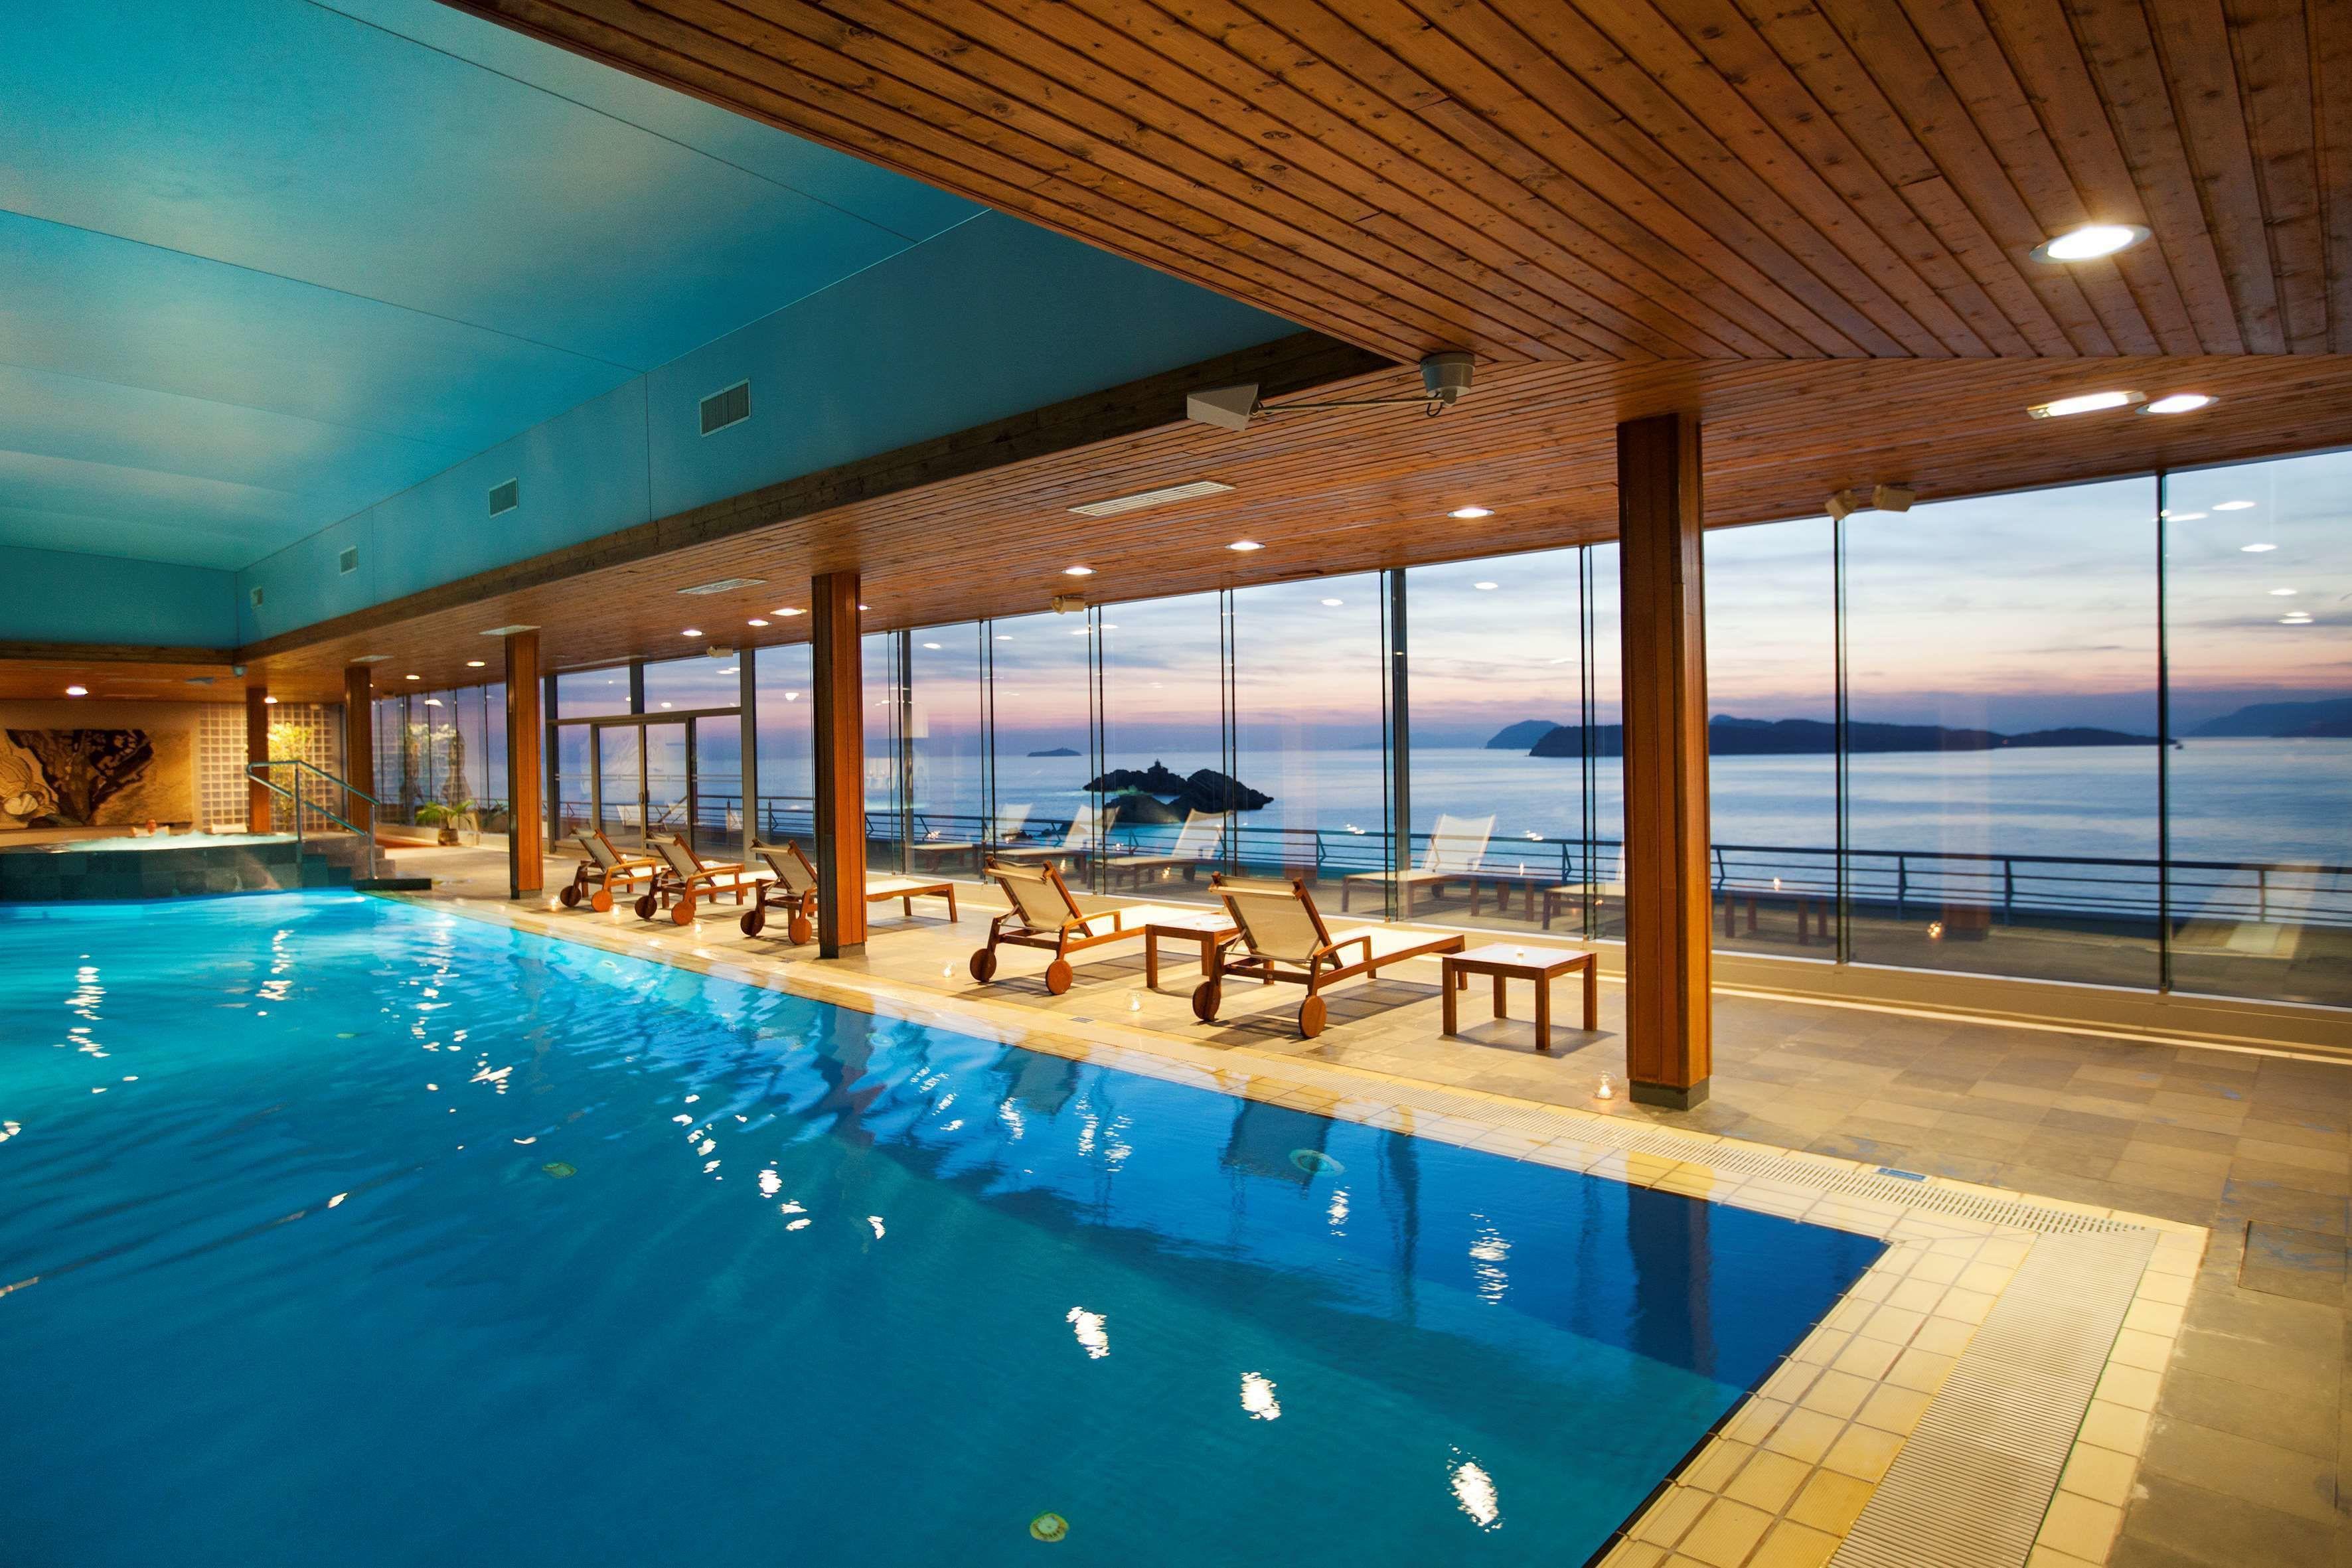 Courtesy of Hotel Dubrovnik Palace / Expedia